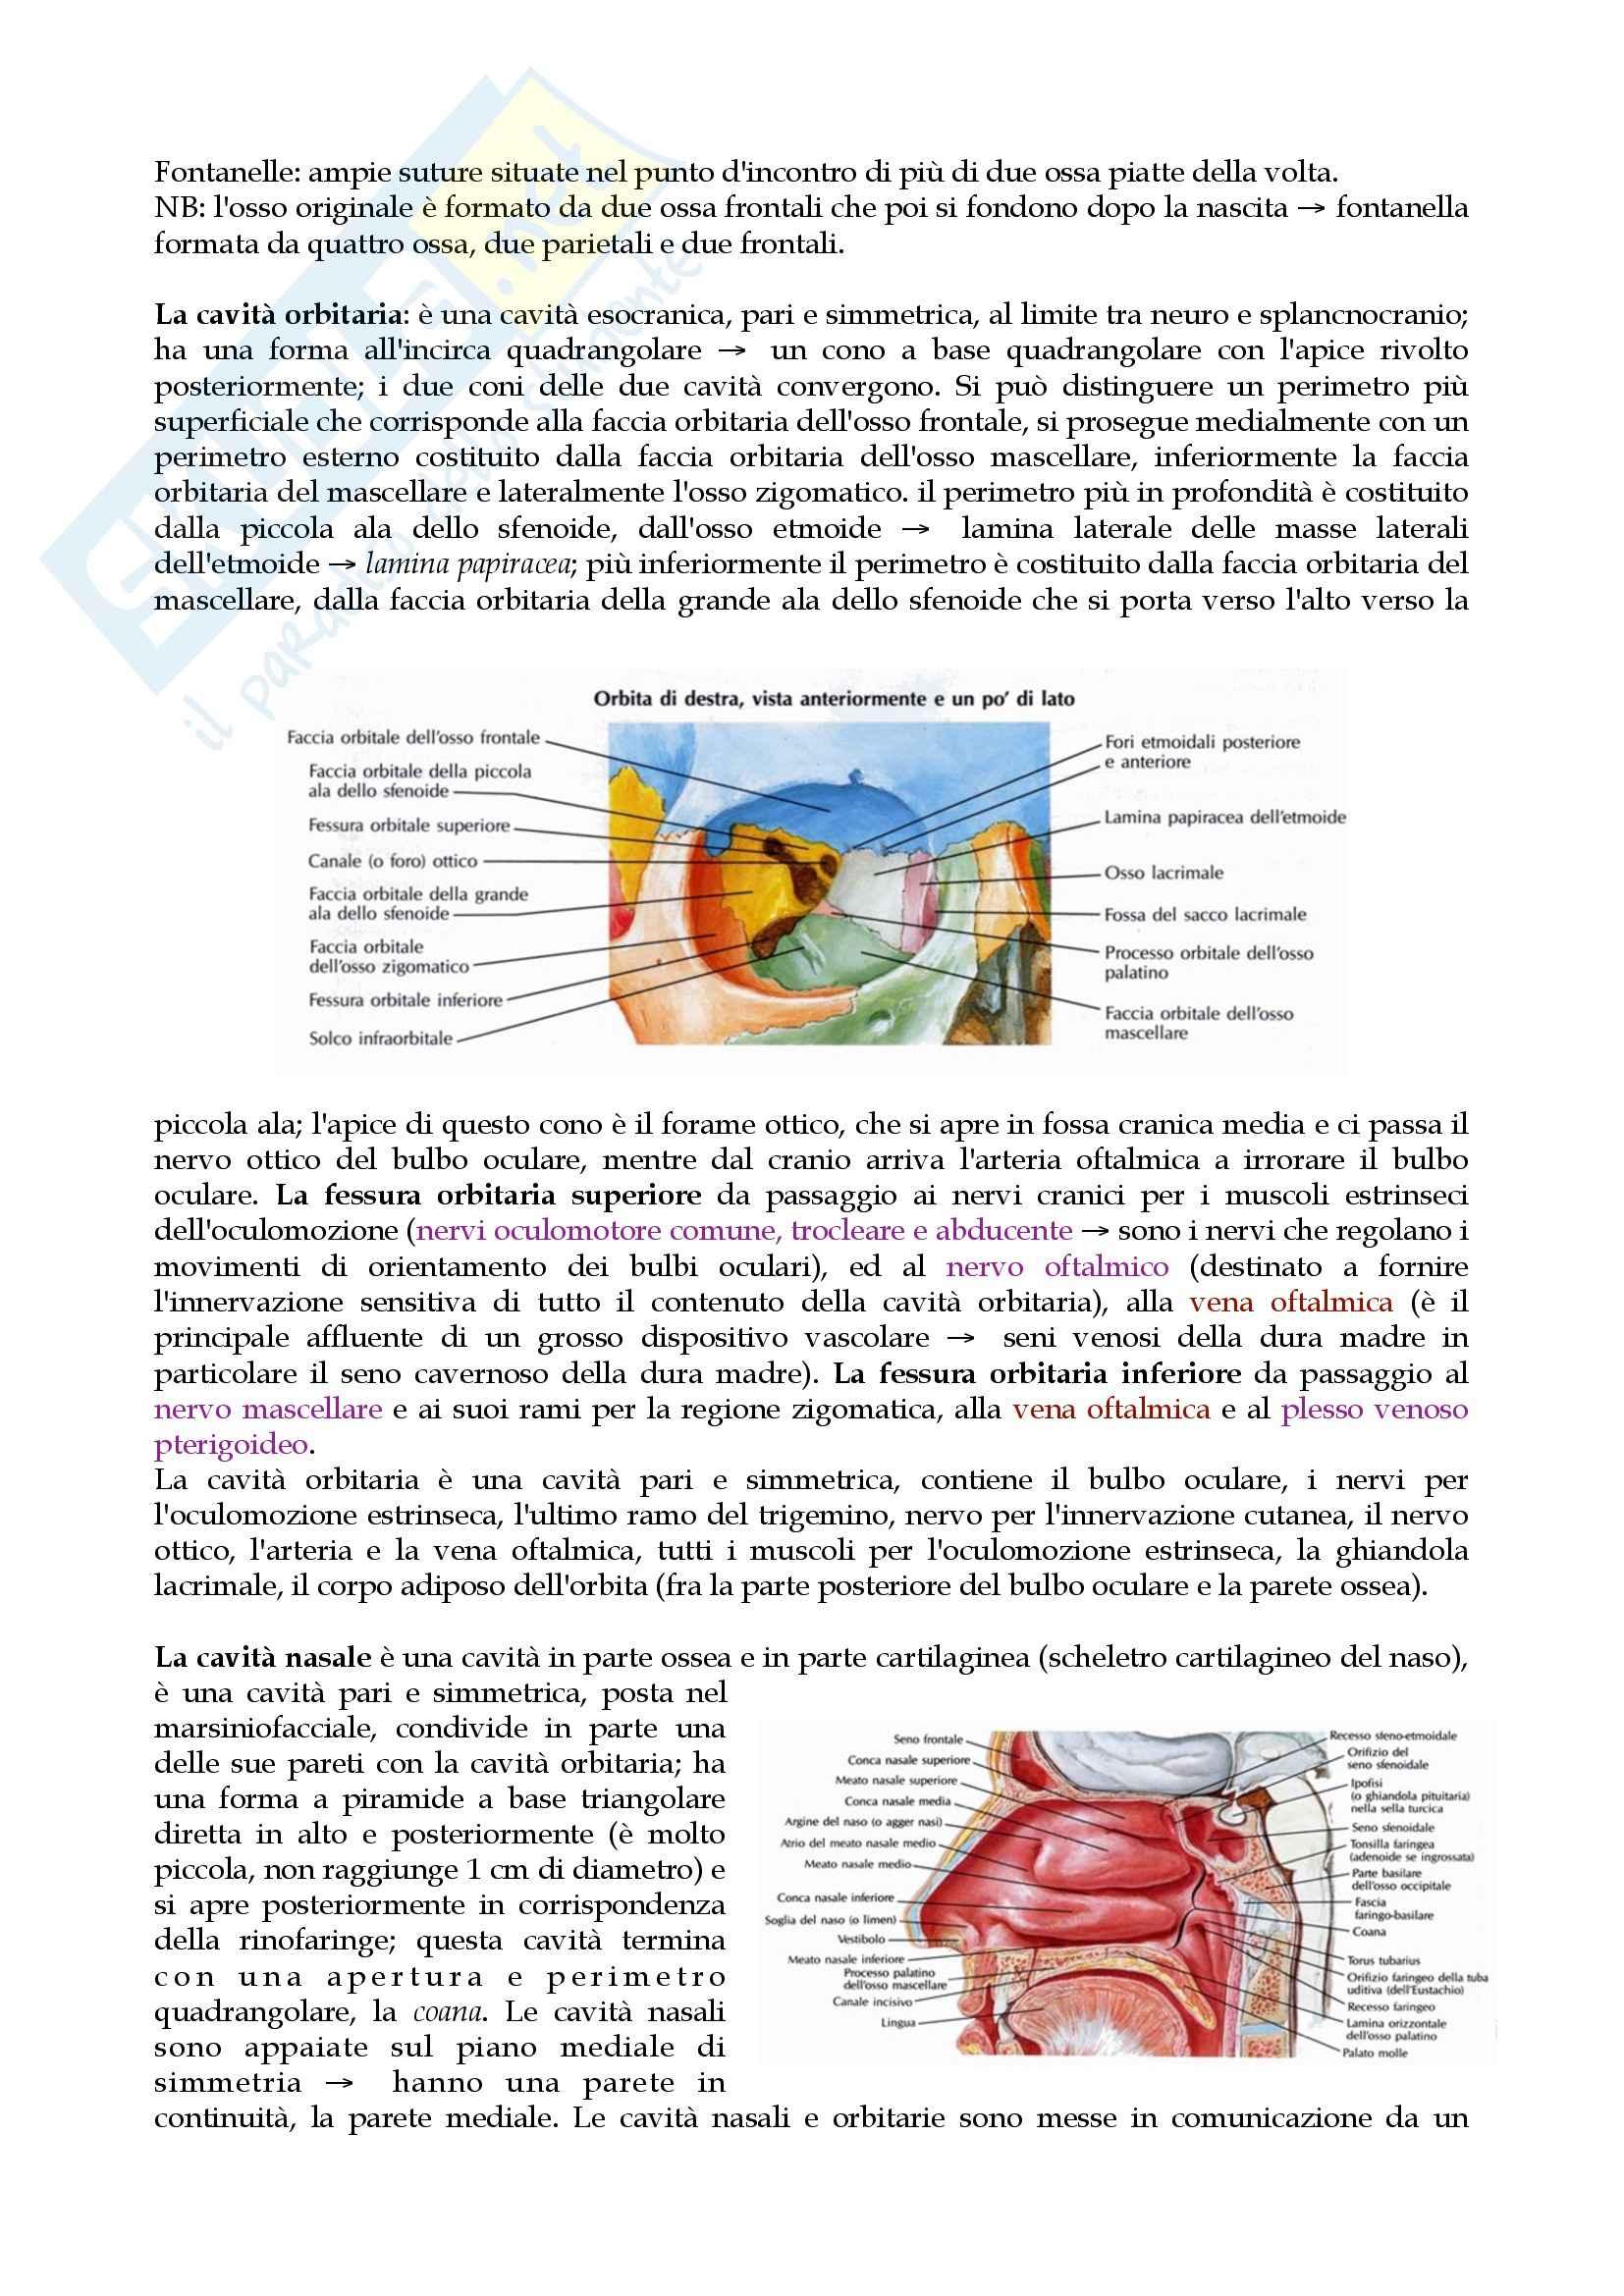 Anatomia: apparato locomotore Pag. 6